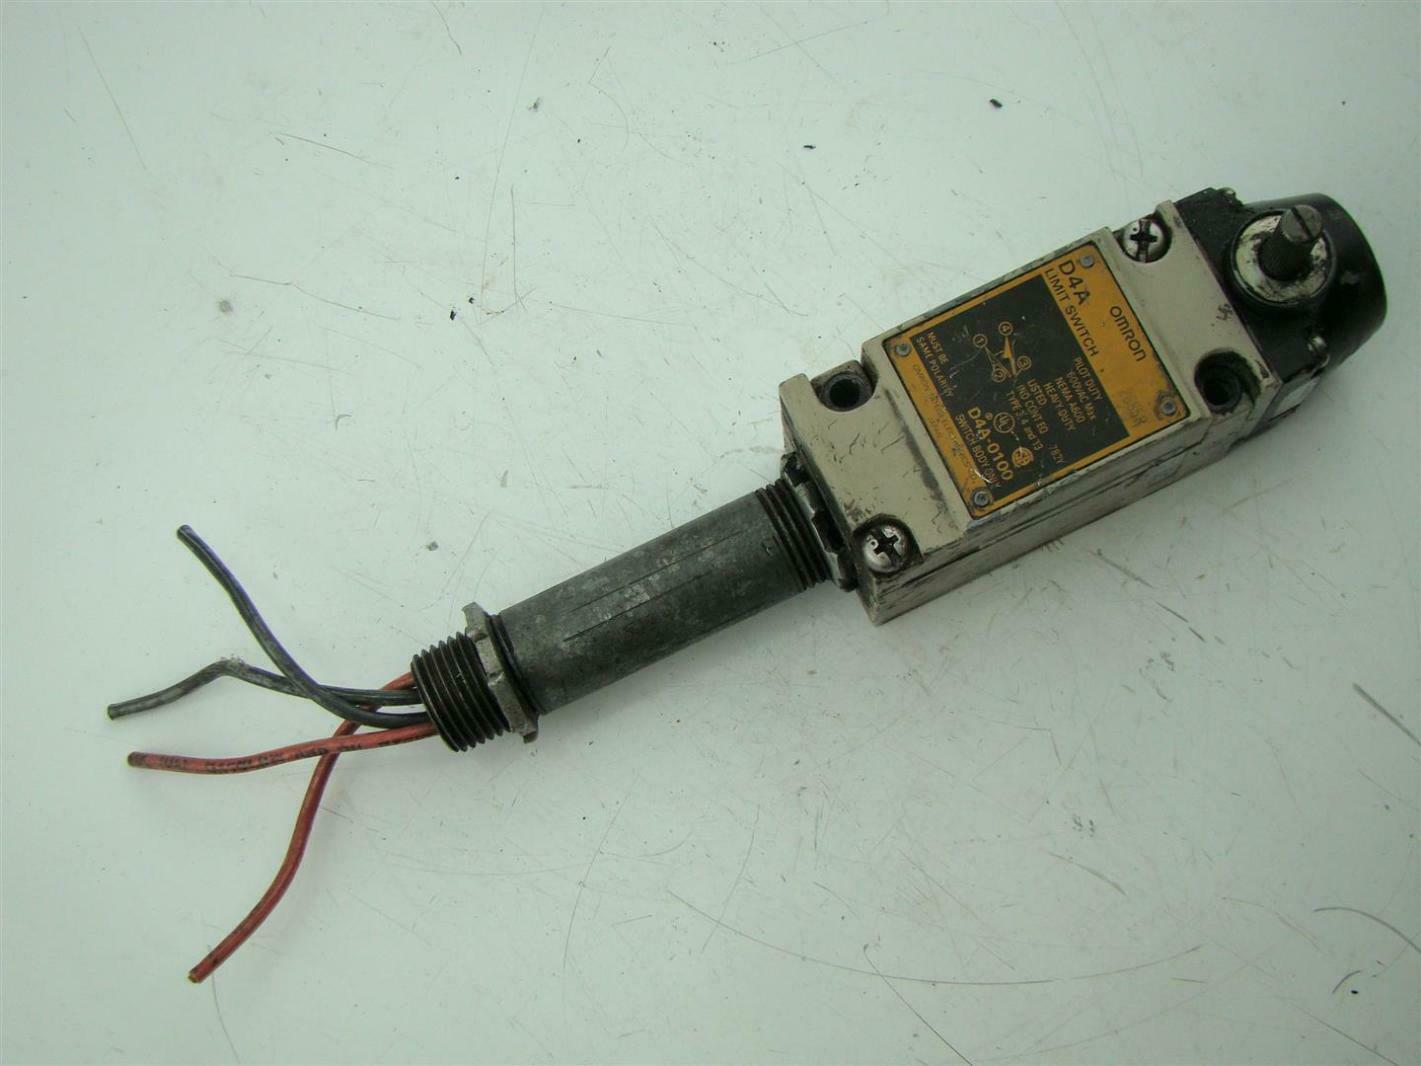 Omron 600Vac D4A Limit Switch D4A-0100 | eBay